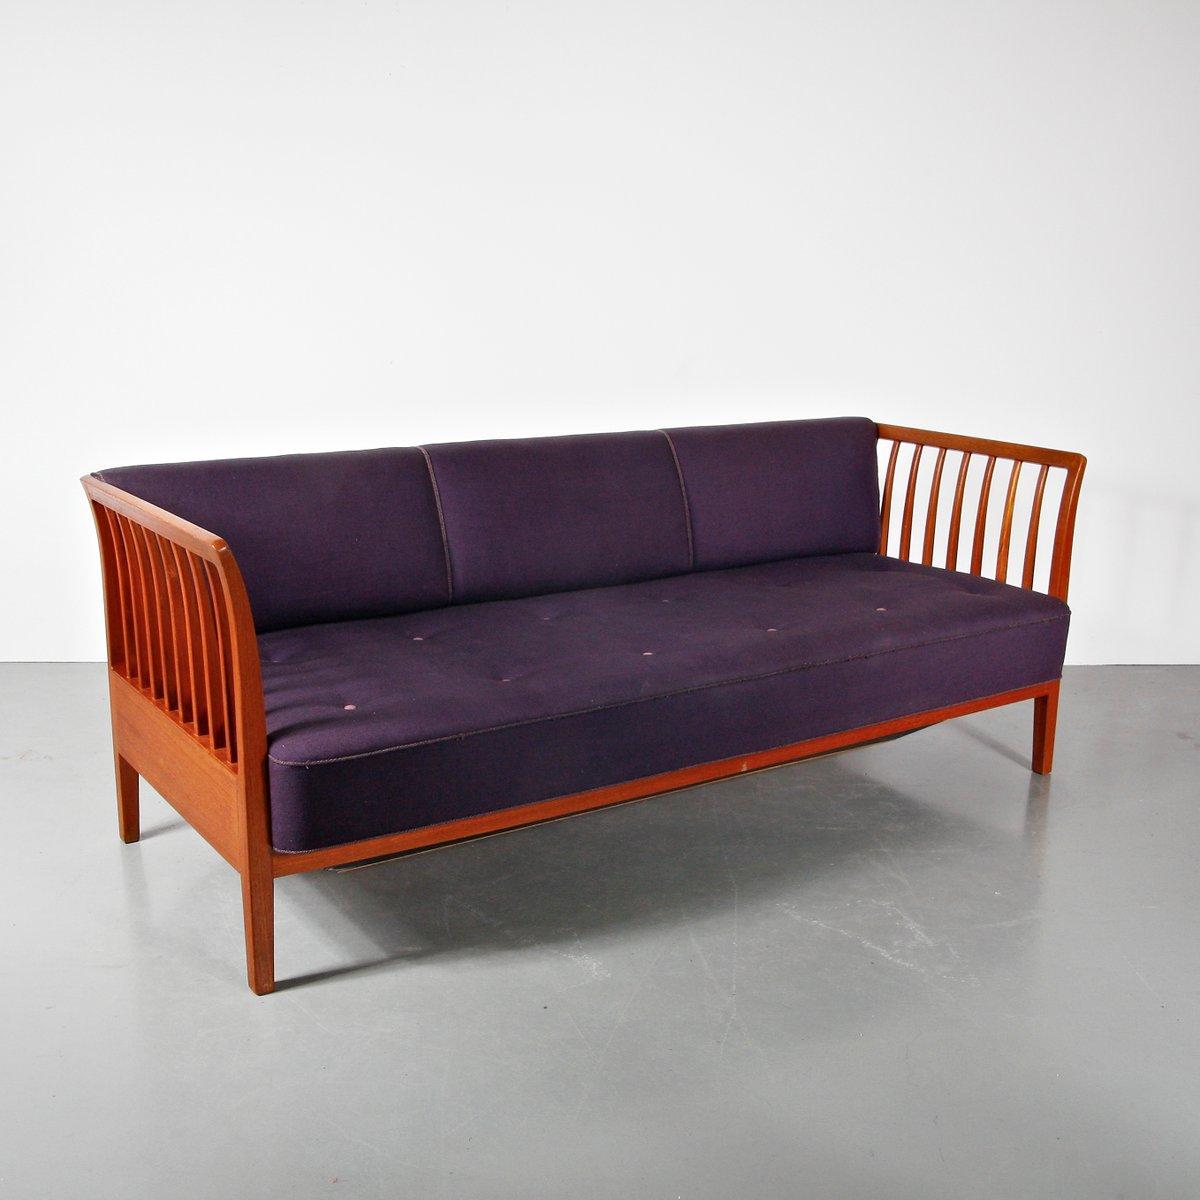 sofa von ludvig pontoppidan circa 1940 bei pamono kaufen. Black Bedroom Furniture Sets. Home Design Ideas